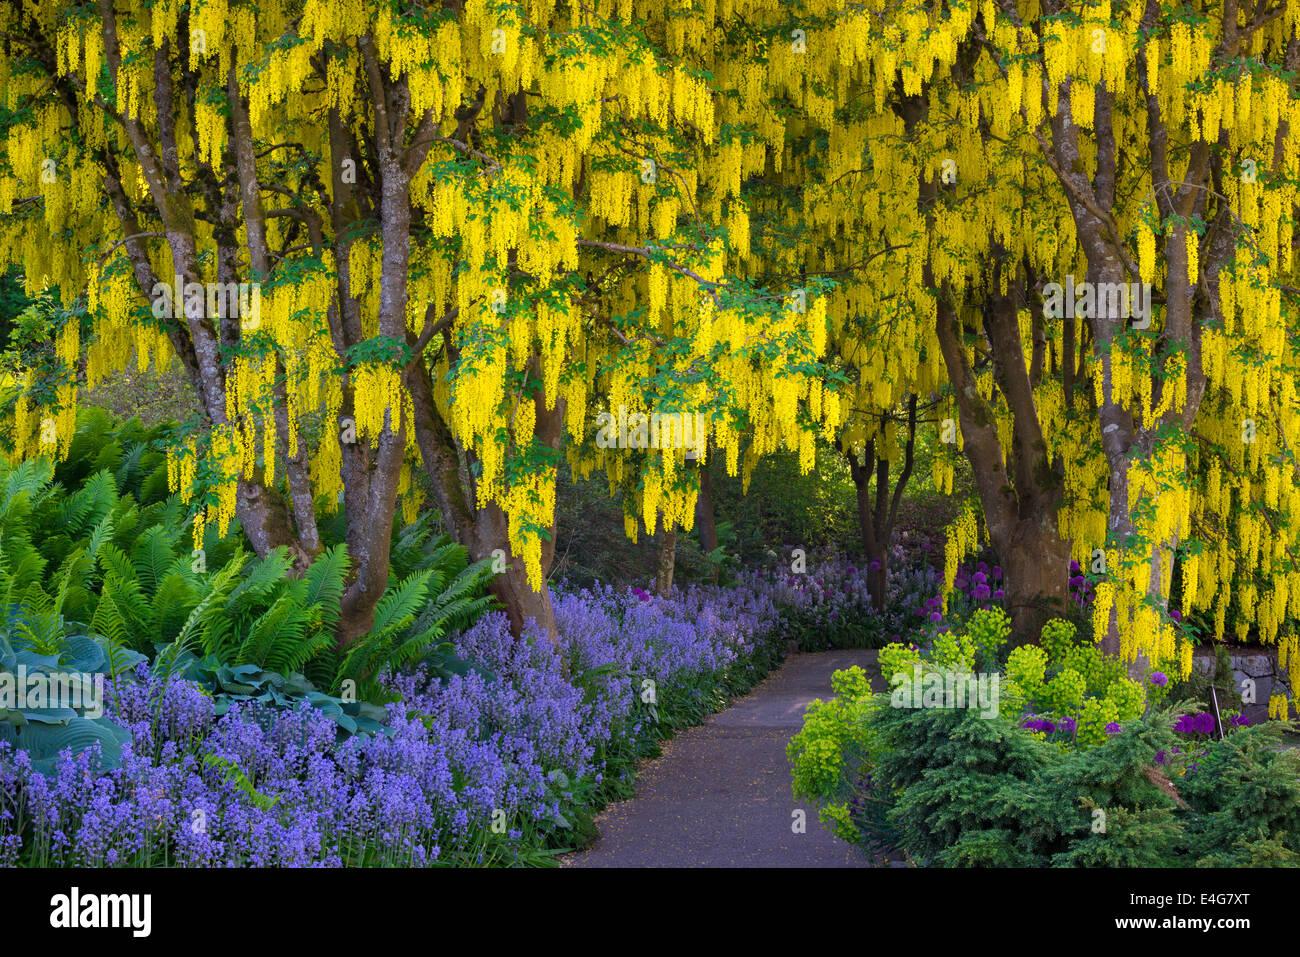 Laburnum golden chain trees purple alliums and blue